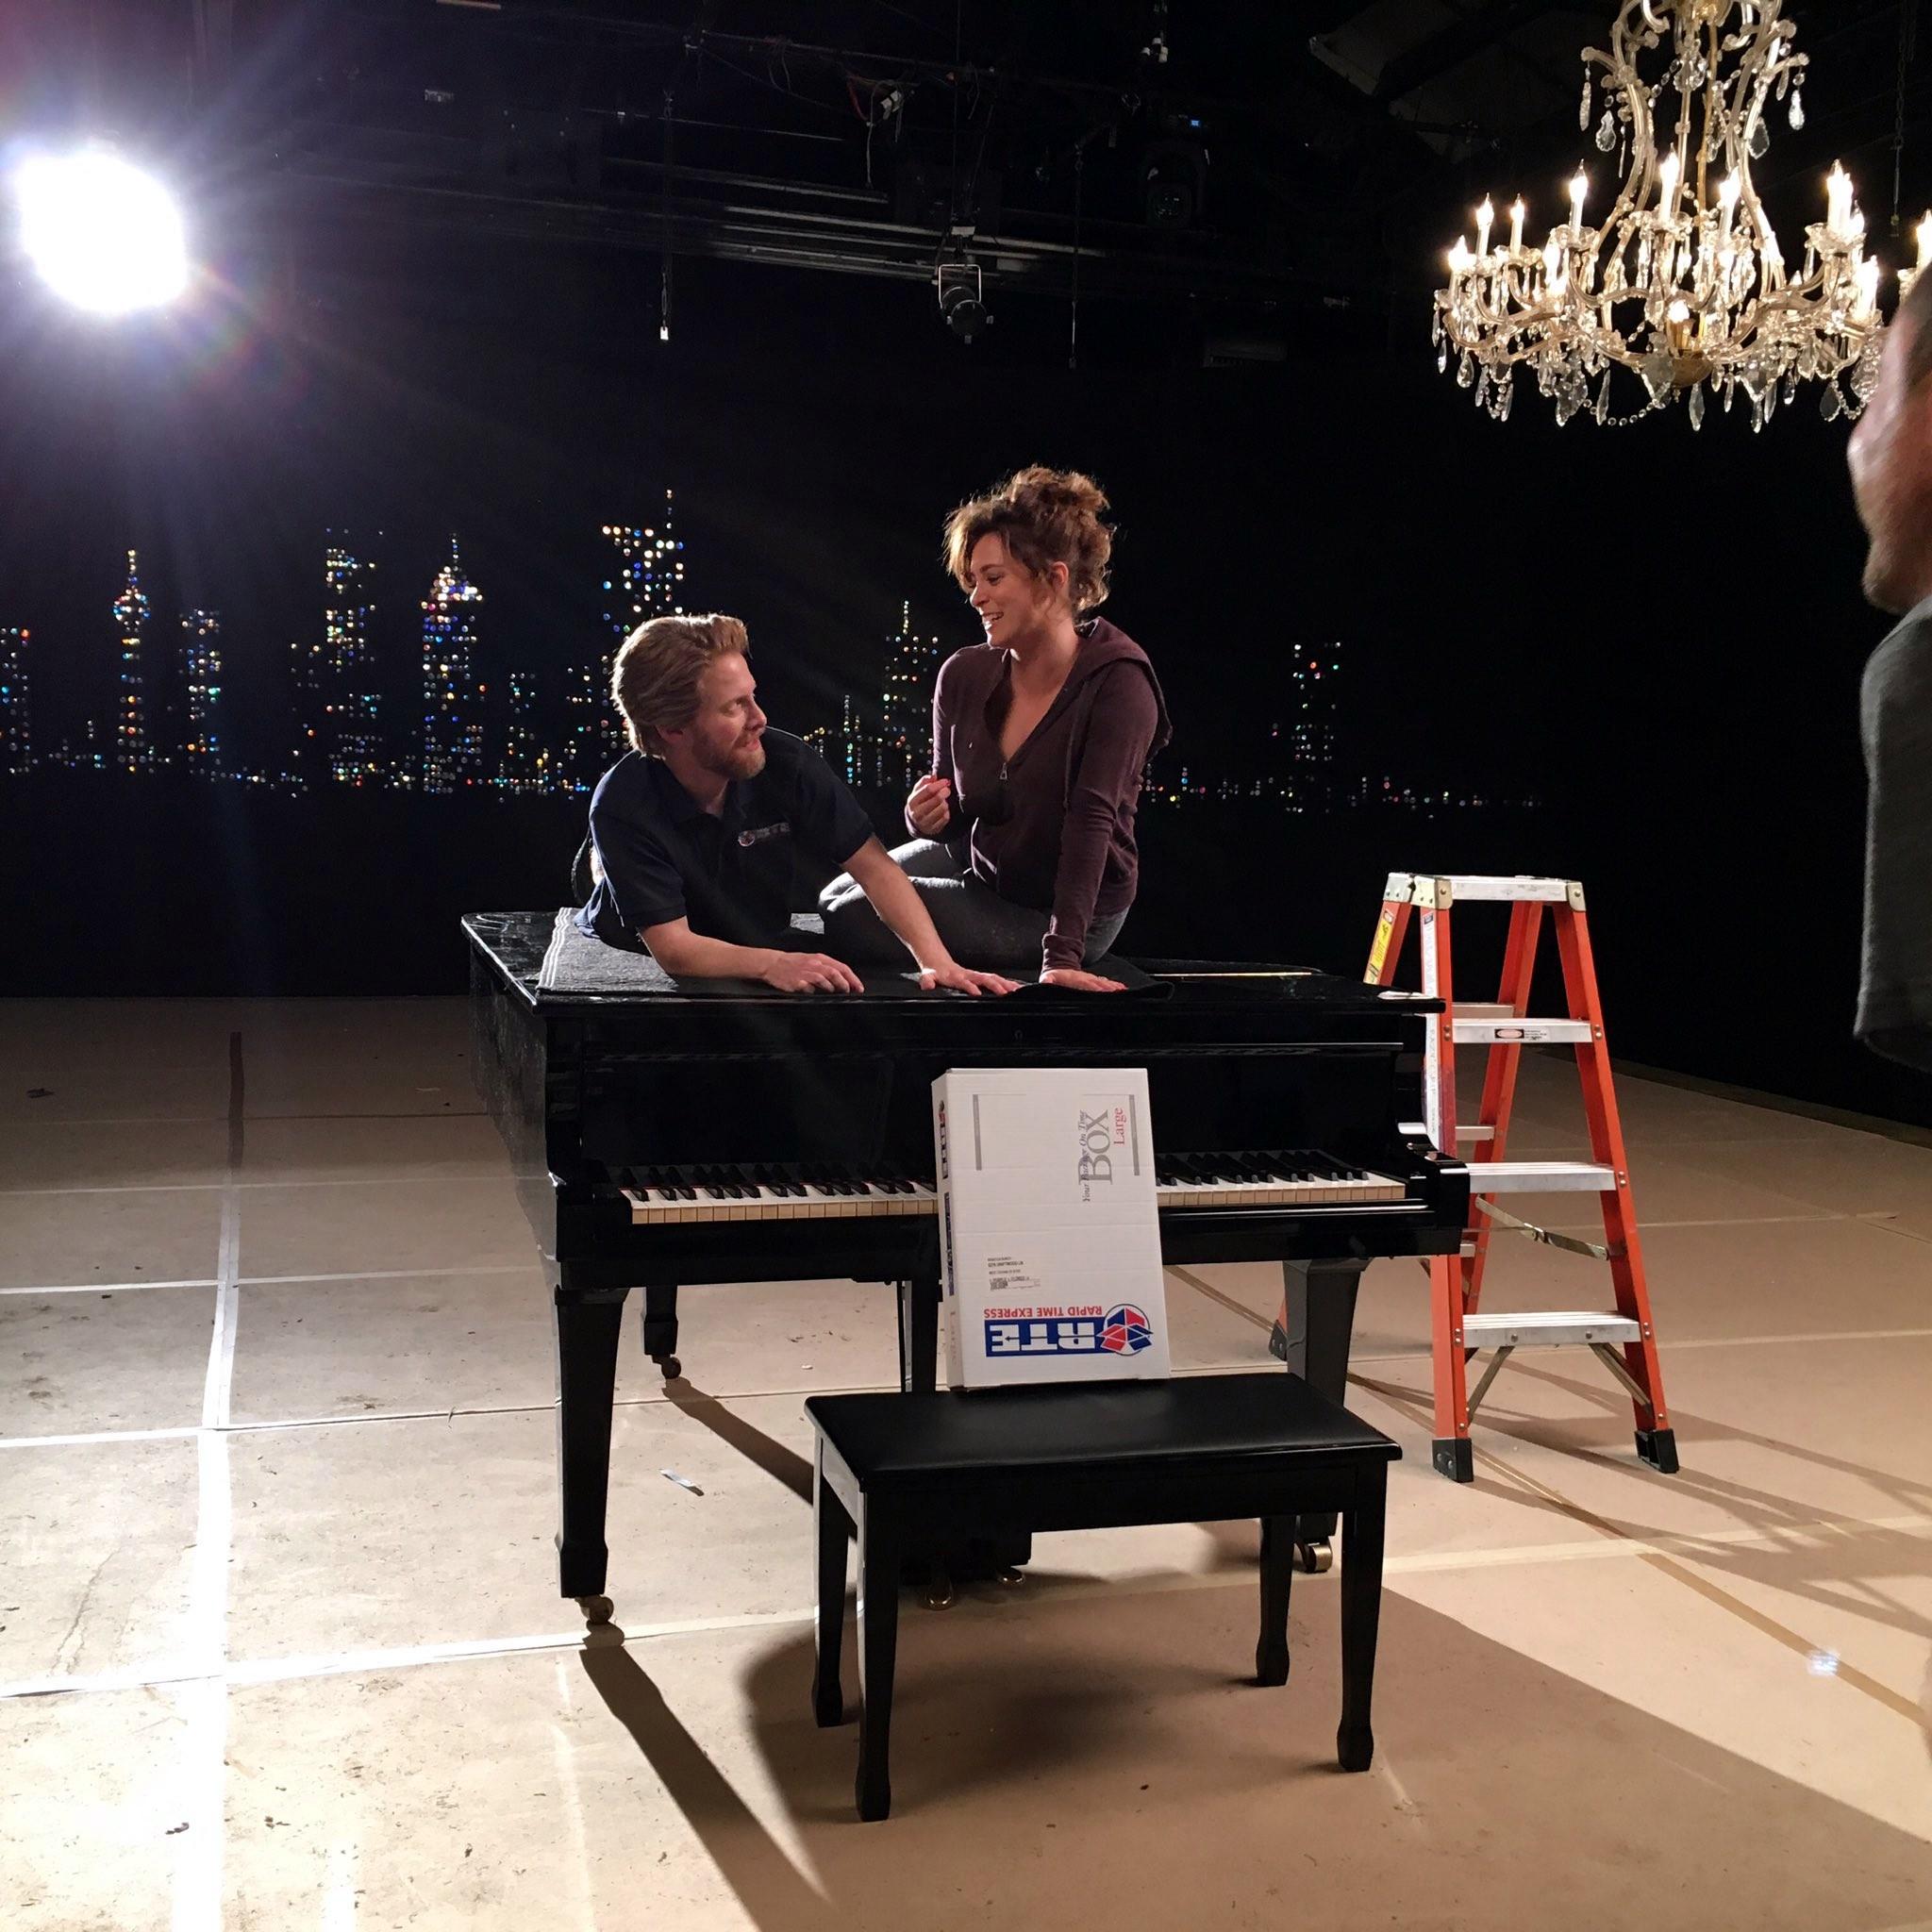 Seth Green and Rachel Bloom in Crazy Ex-Girlfriend (2015)